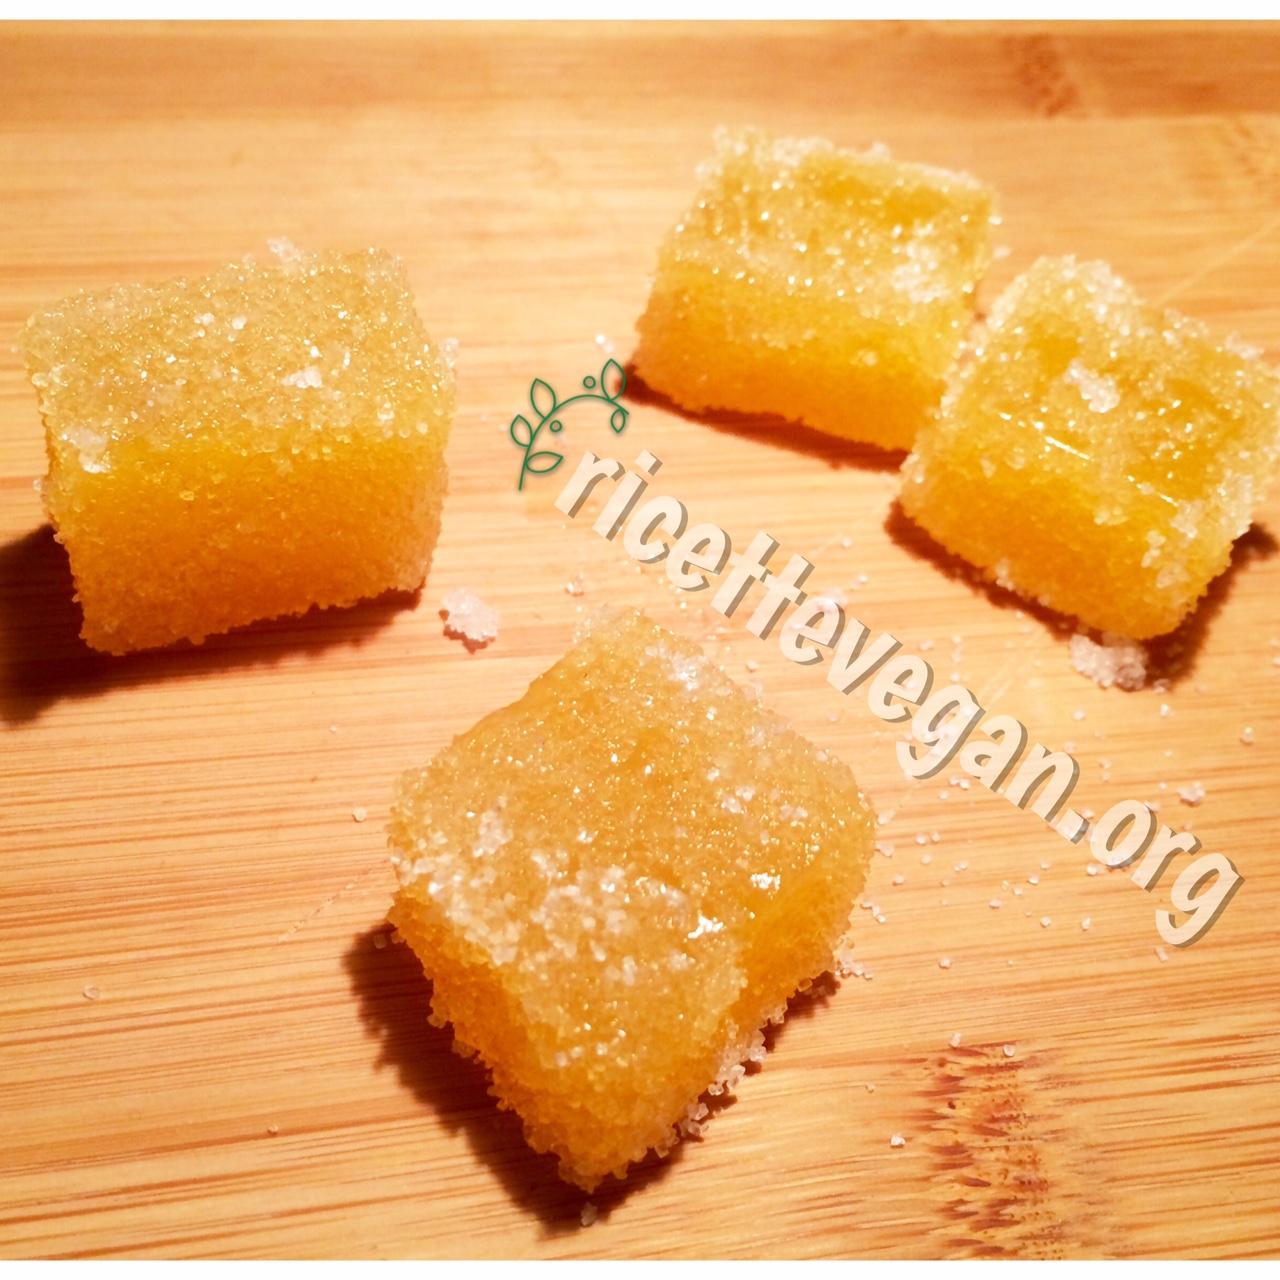 ricettevegan.org - gelatine di frutta 8